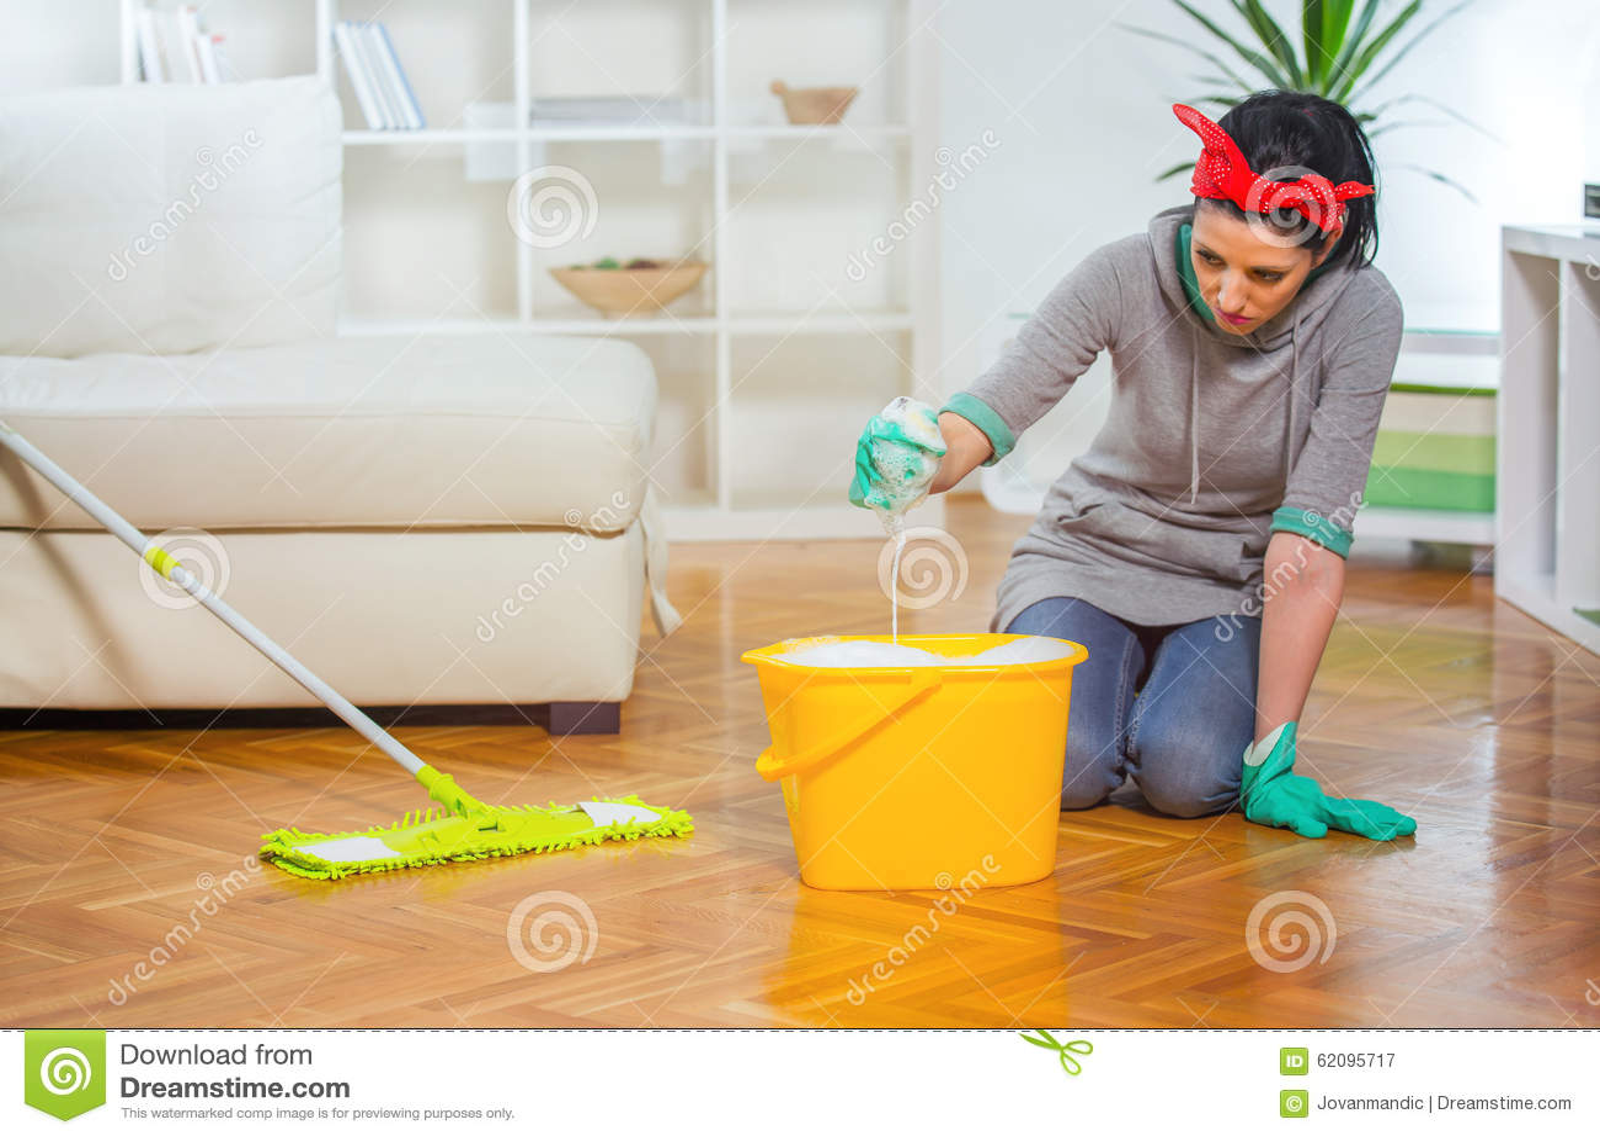 76d94e92a31e Γυναίκα που καθαρίζει το πάτωμα γονατίζοντας Στοκ Εικόνα - εικόνα ...